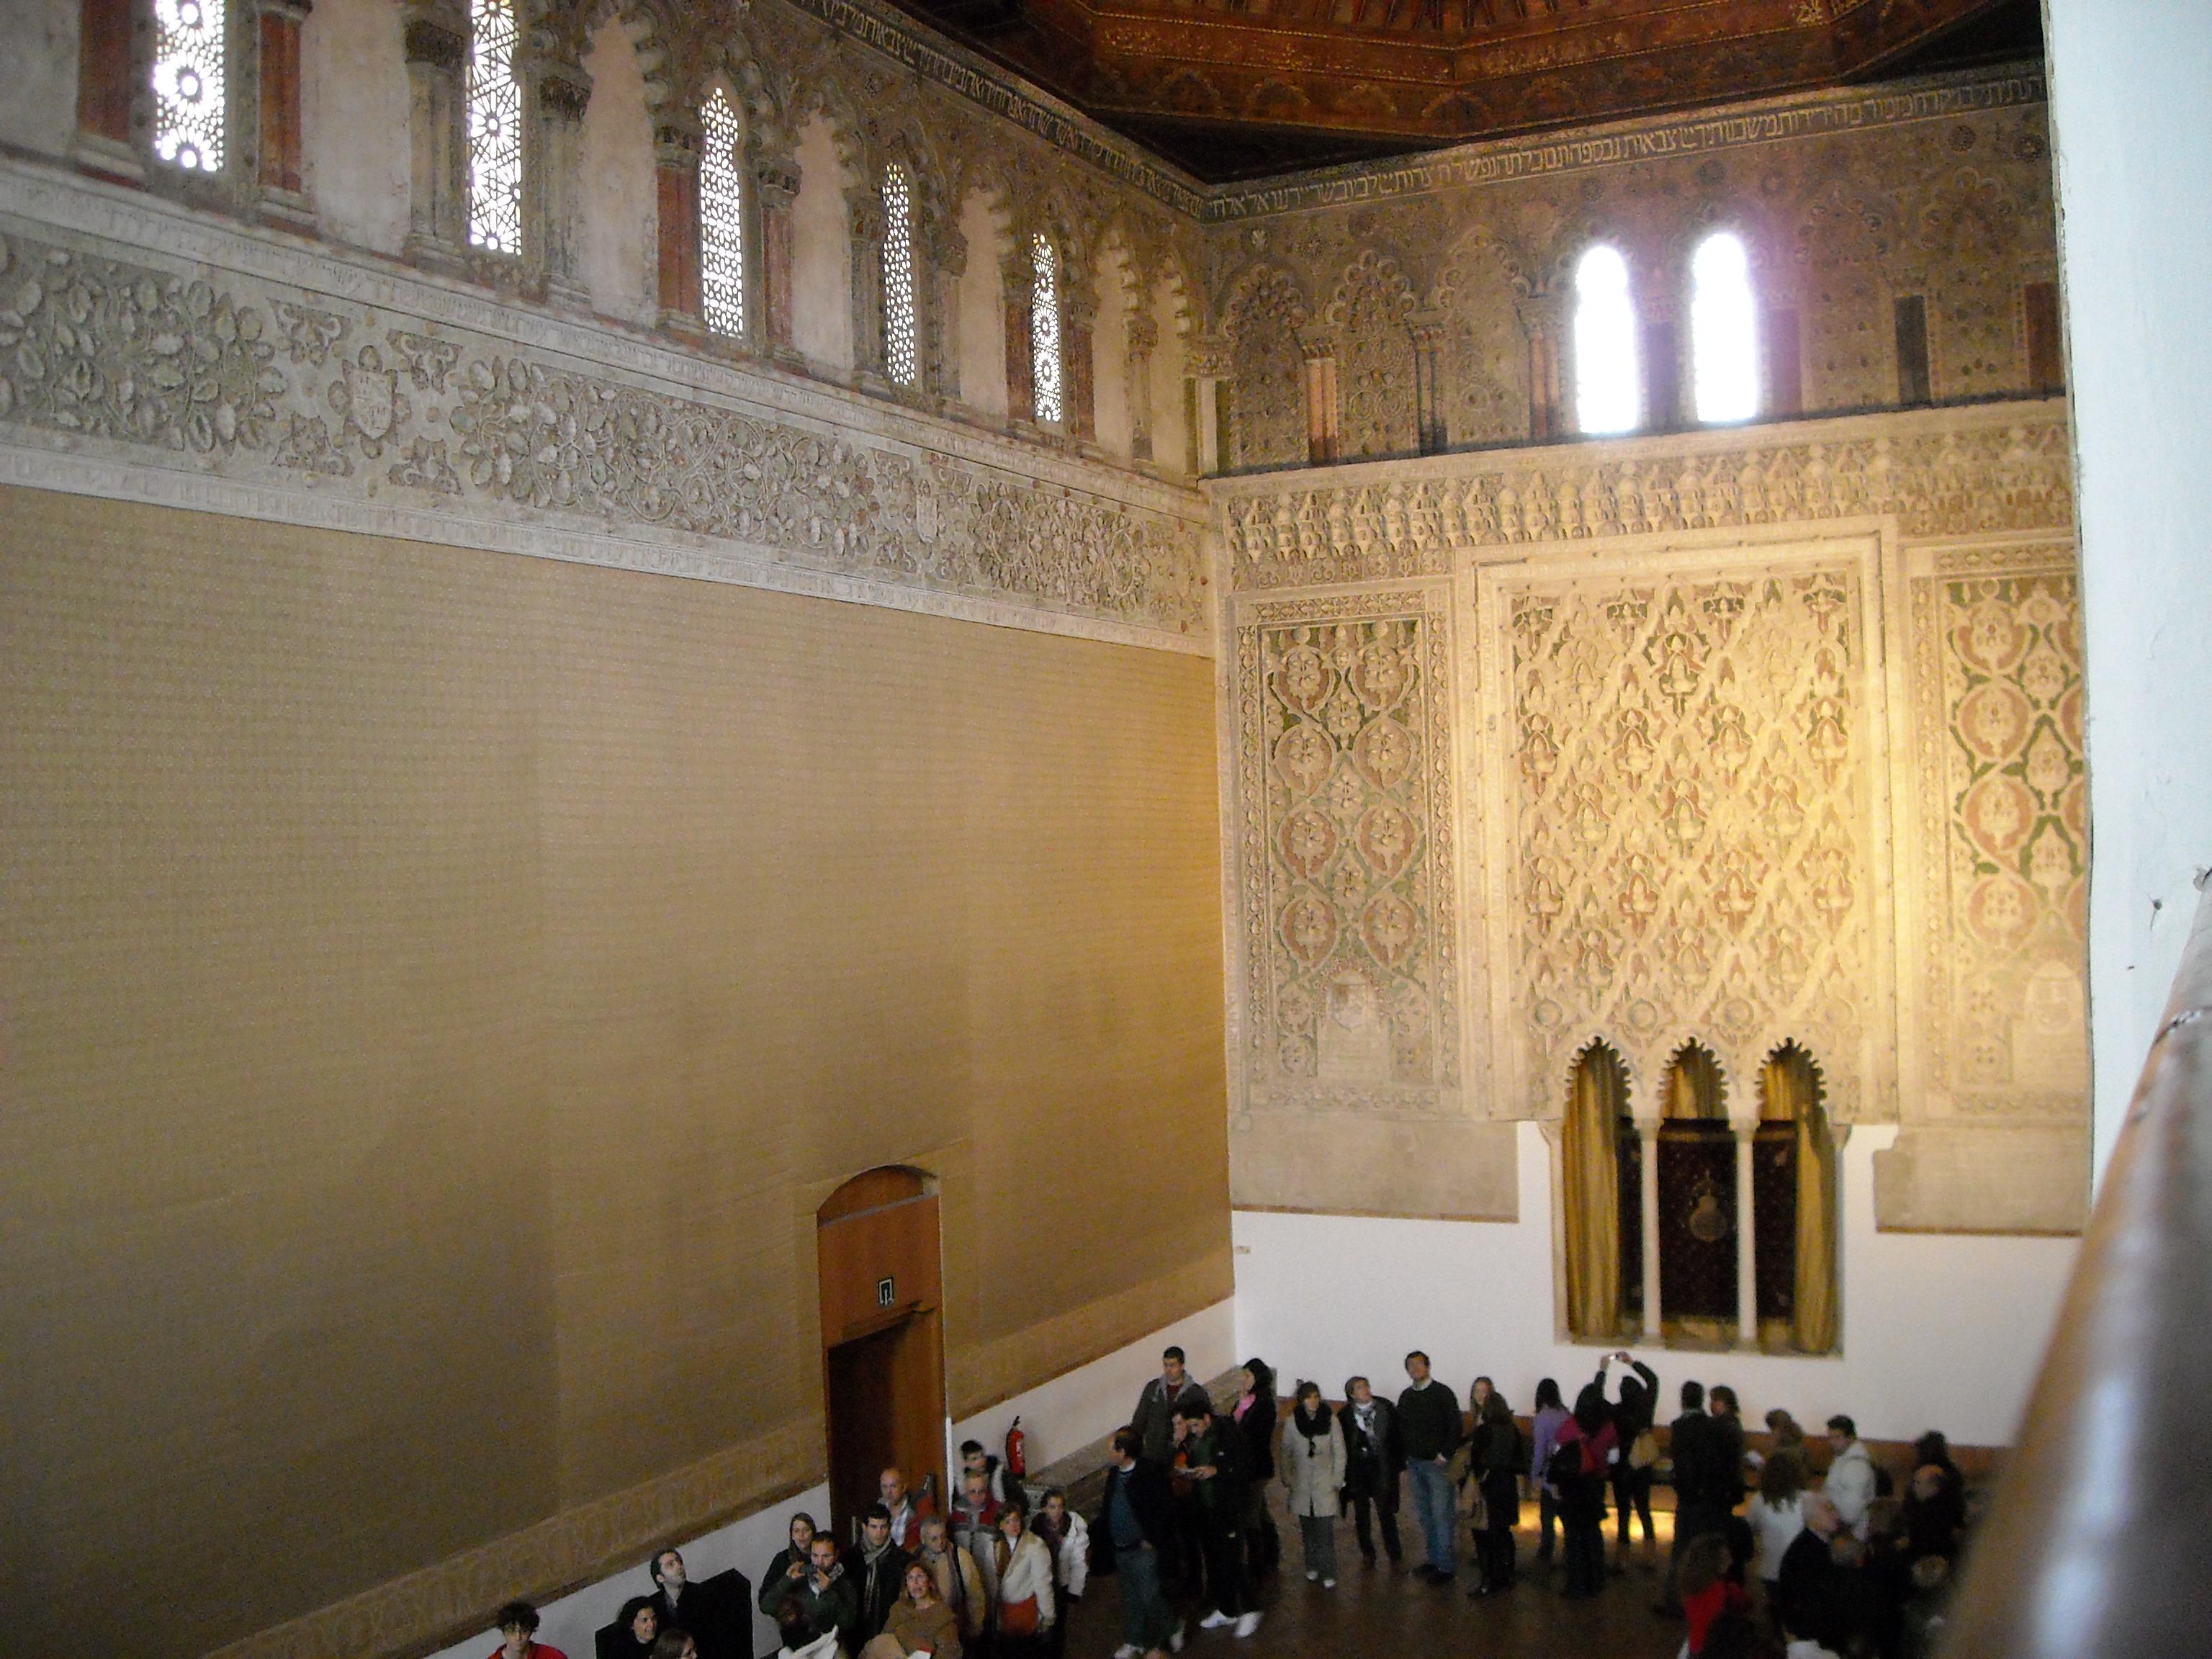 File:Toledo sinagoga Transito.jpg